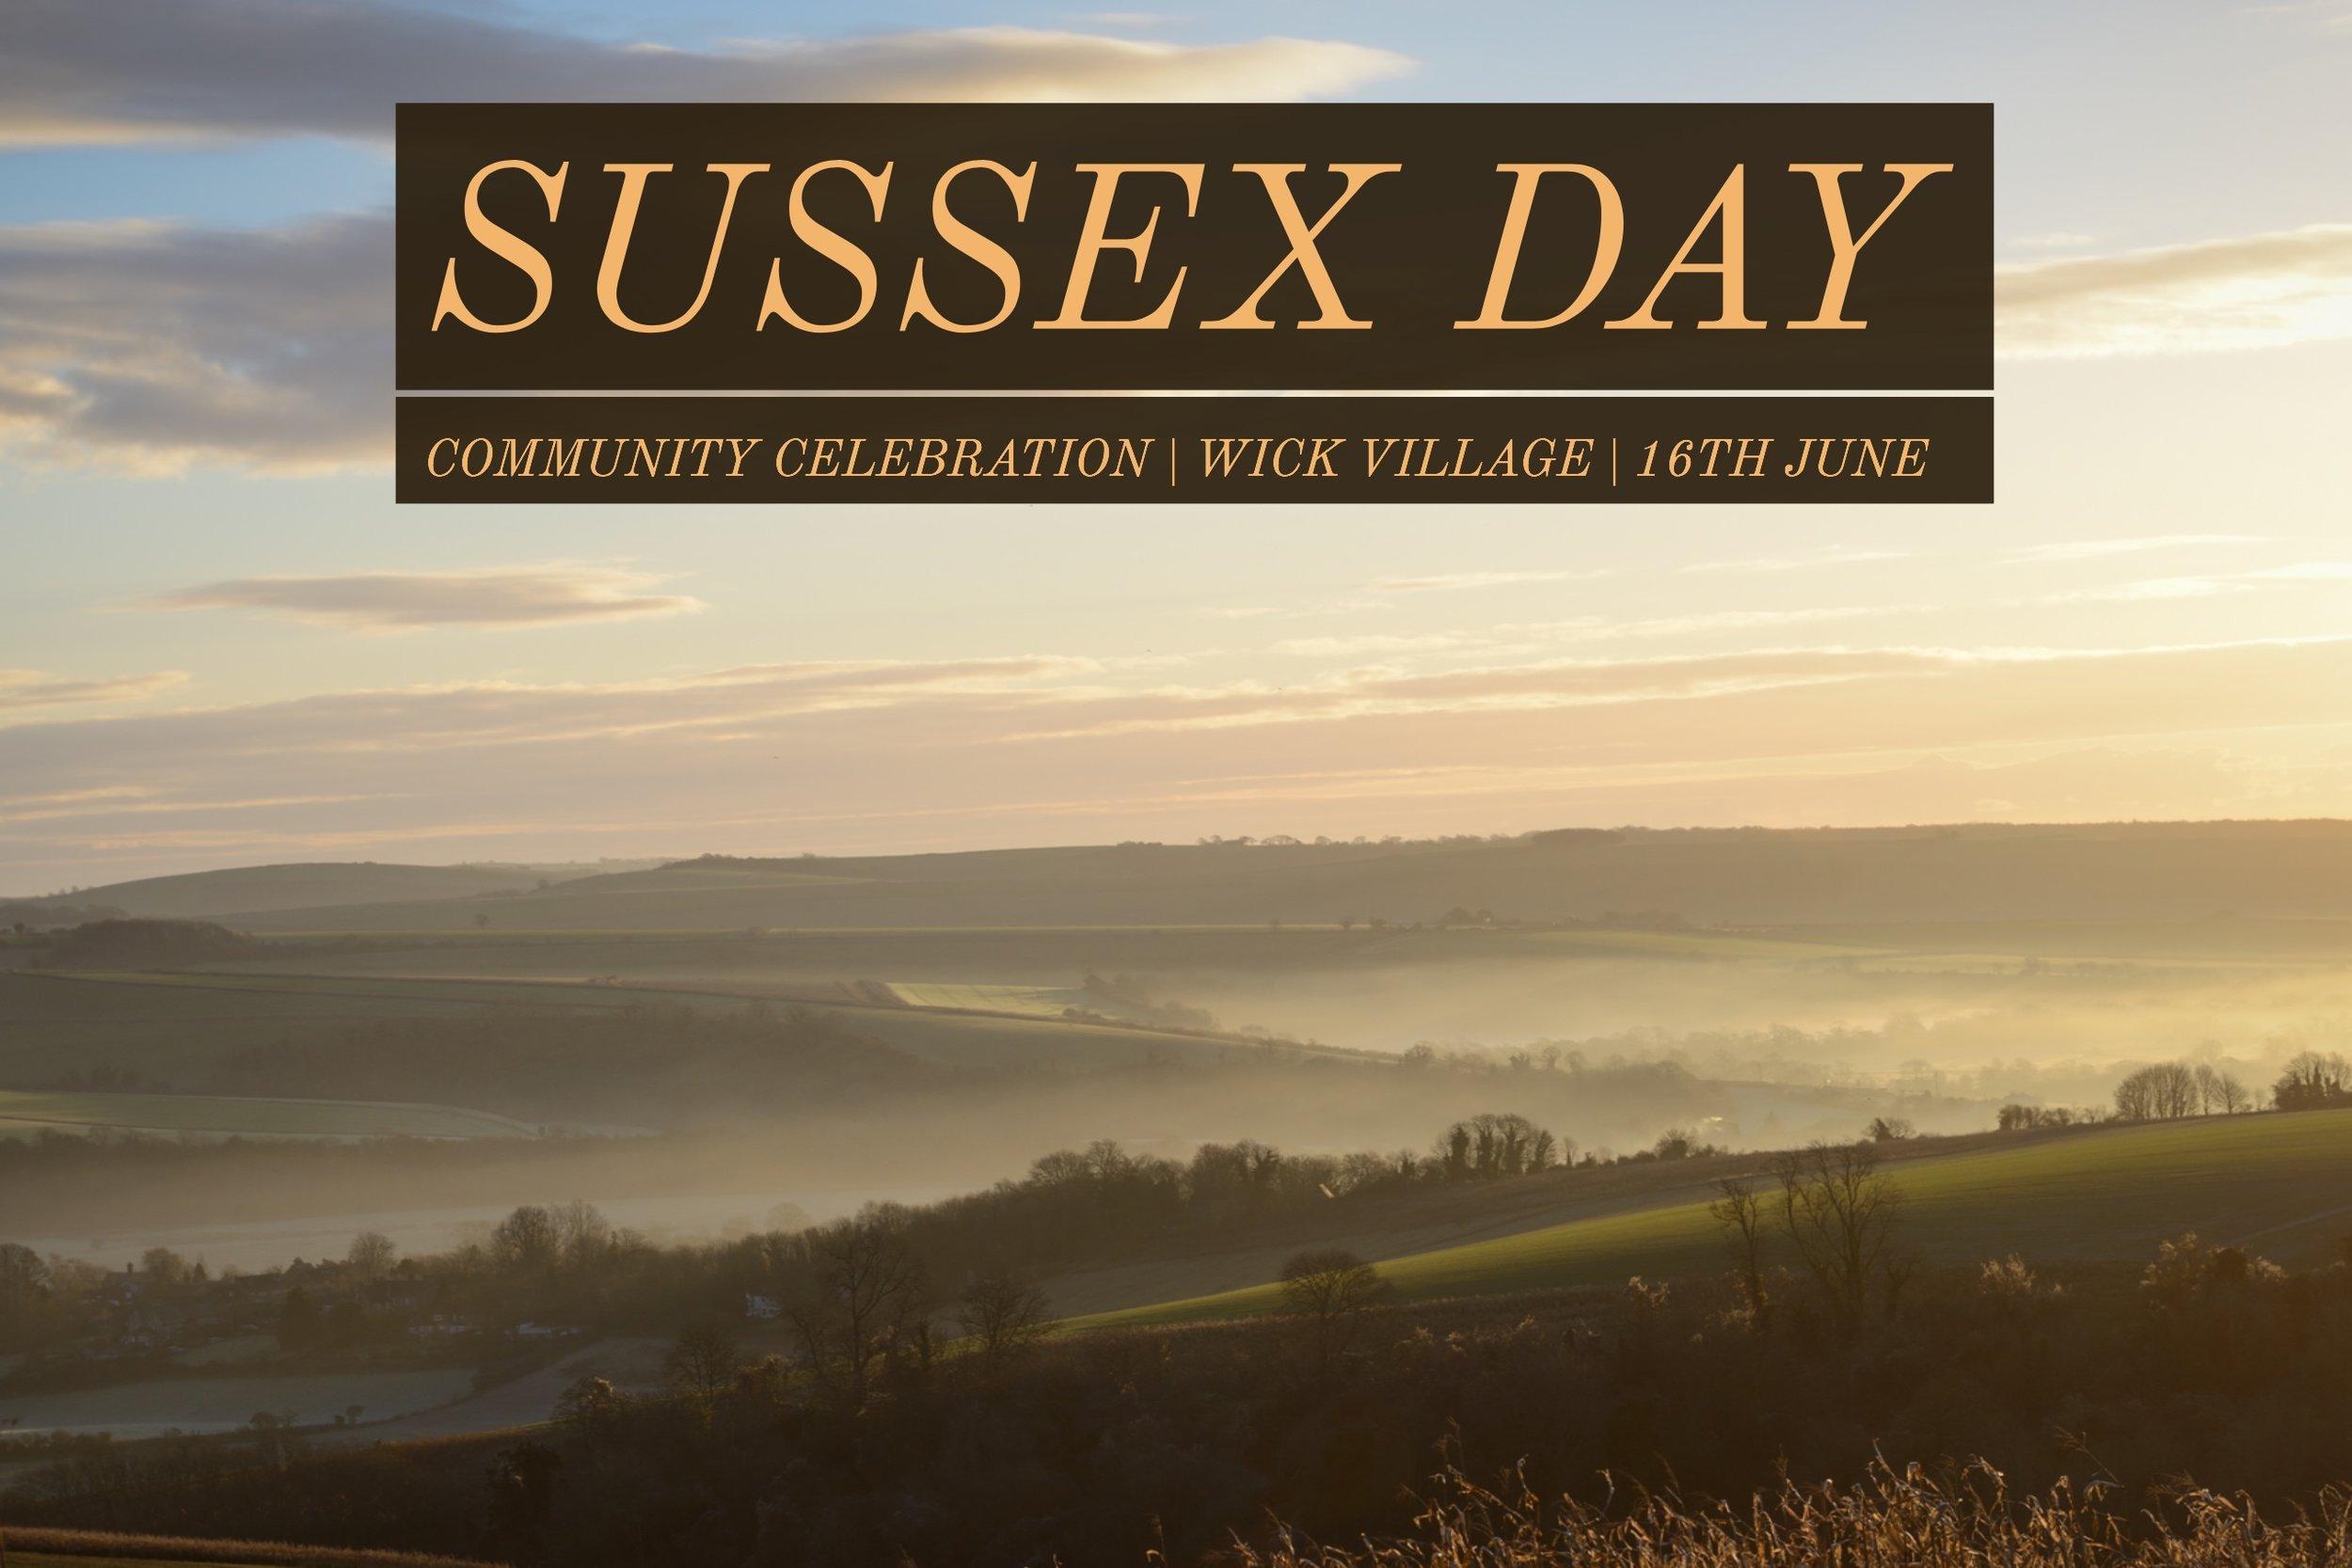 The Wick Village Sussex Day Celebration - Littlehampton, West Sussex.